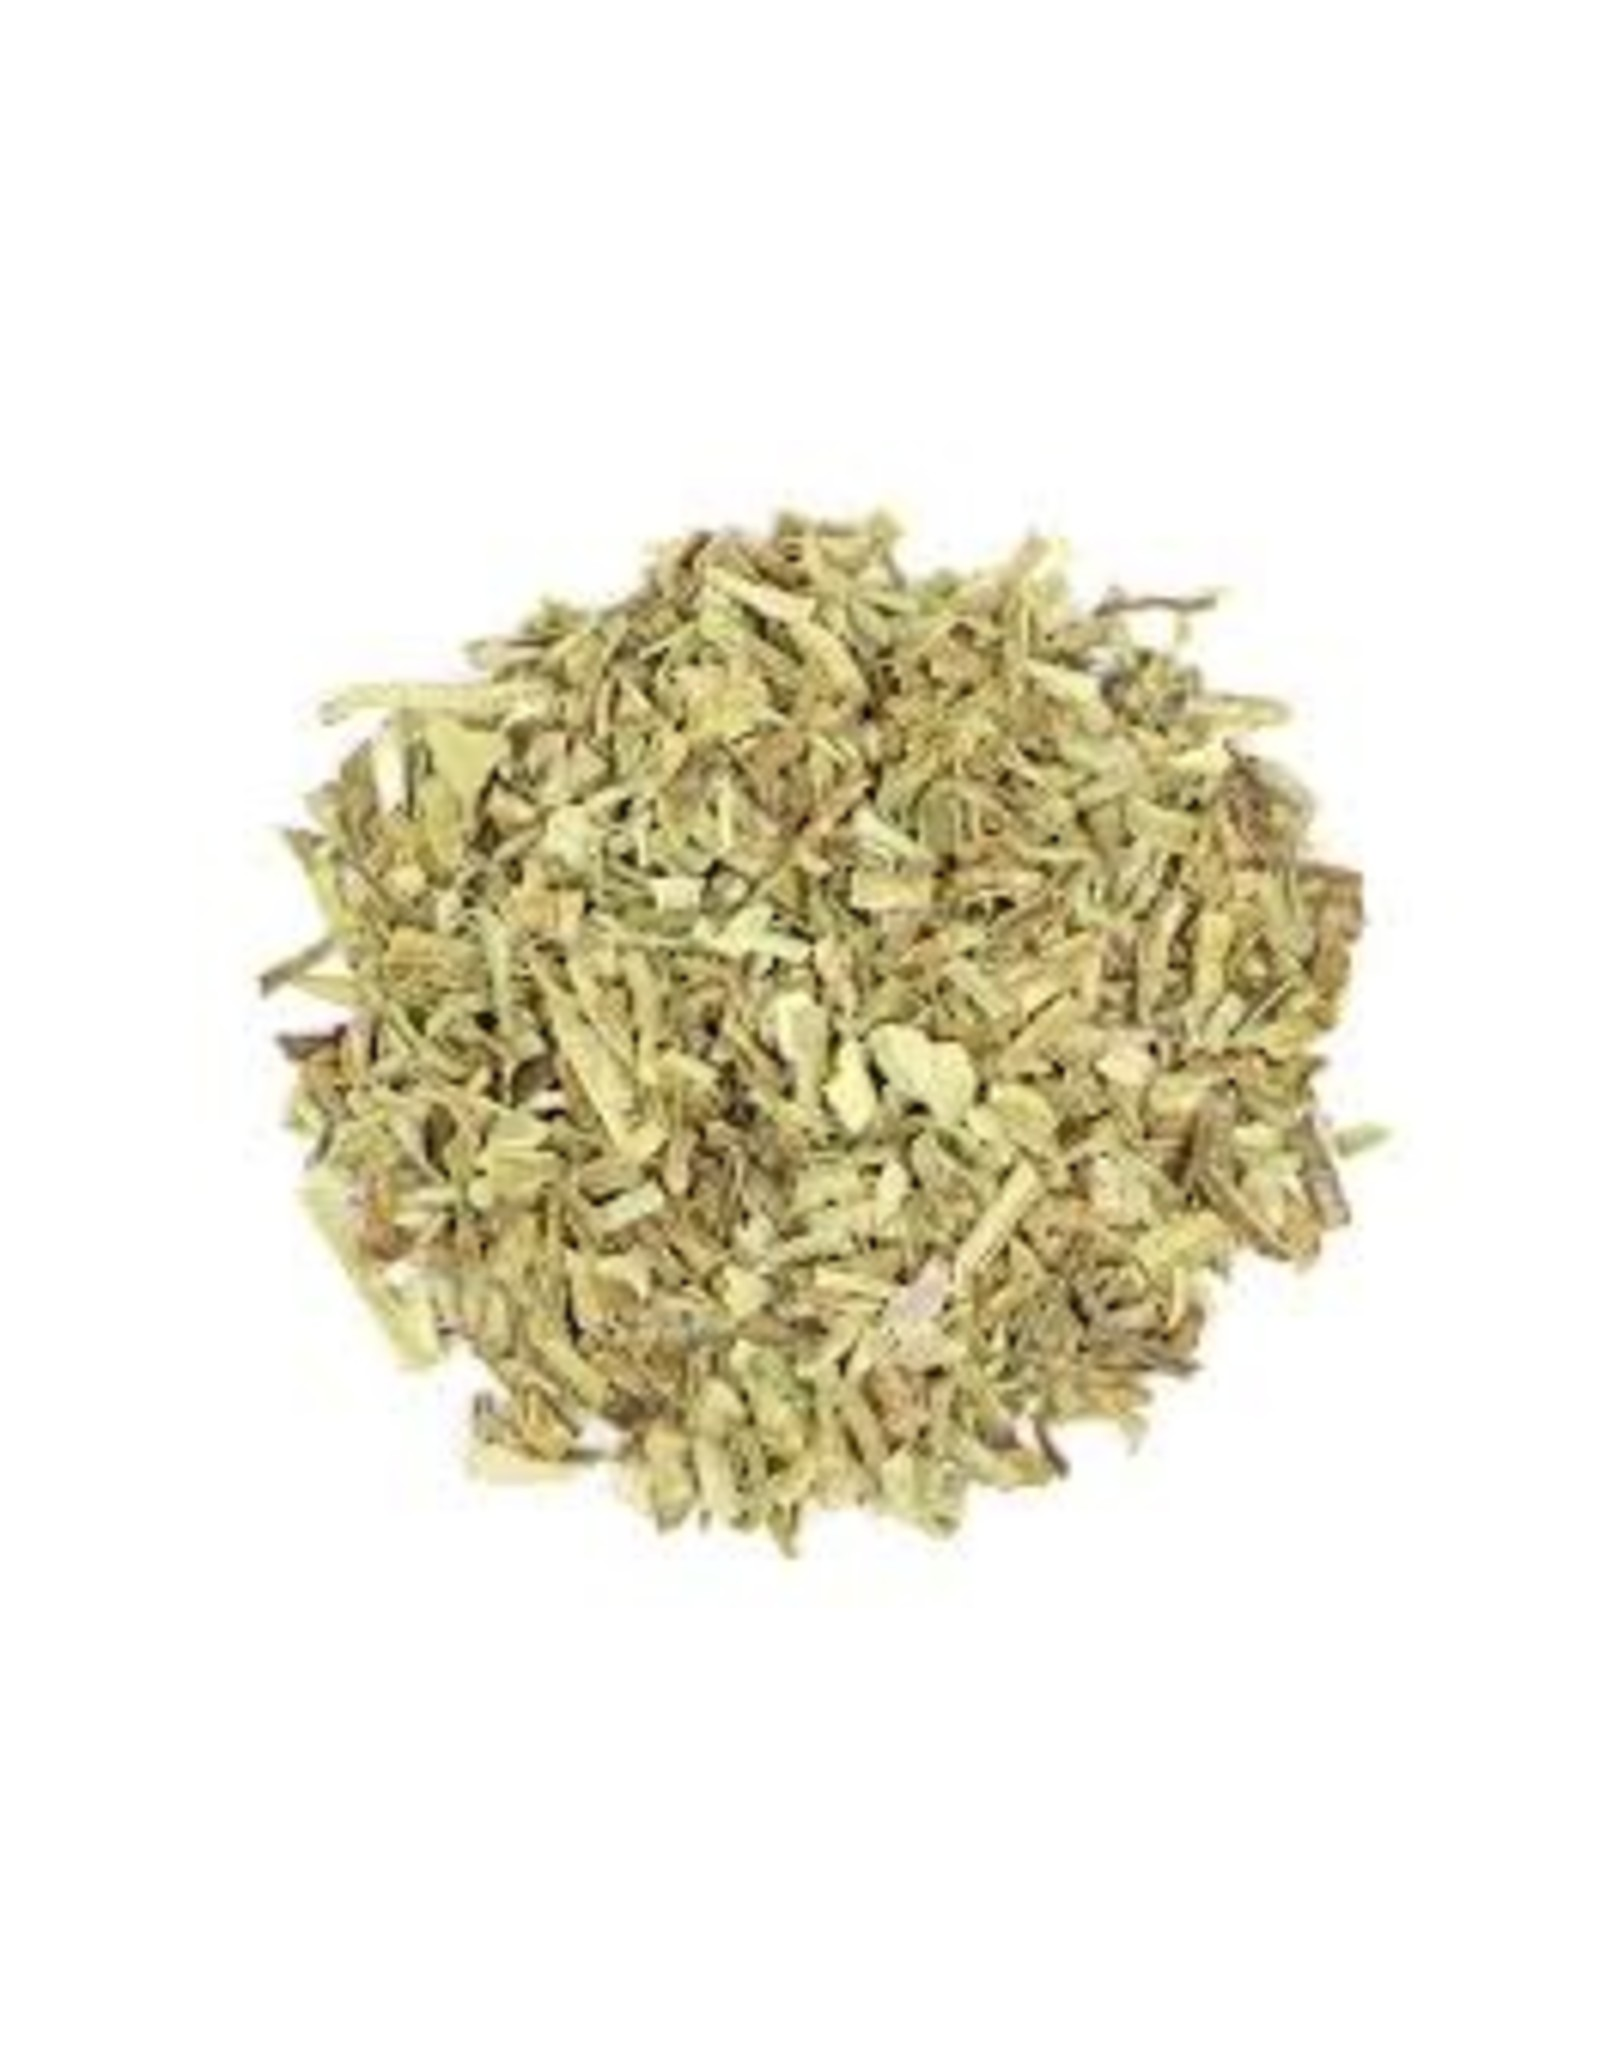 Aloe Vera Leaf herb 1 oz